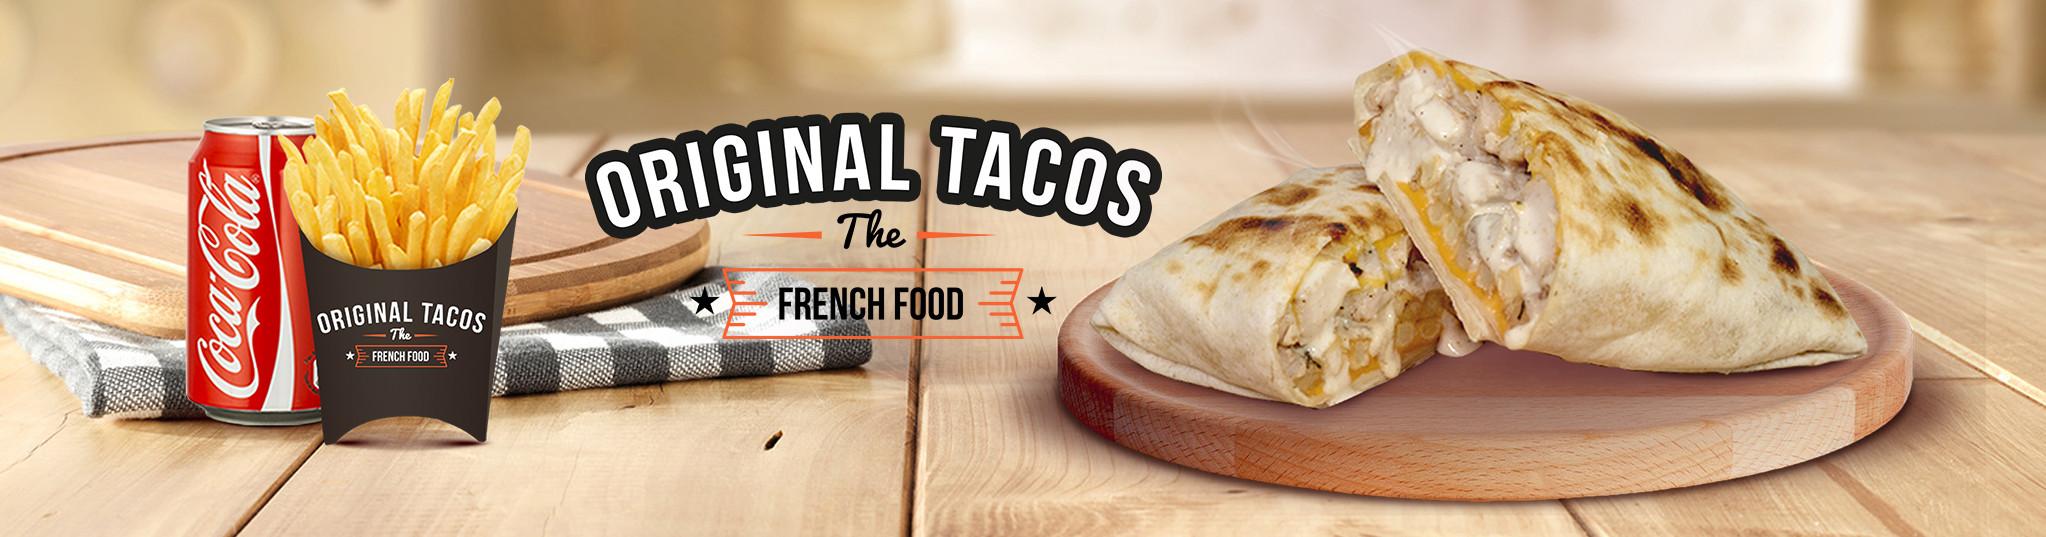 Original Tacos Maroc